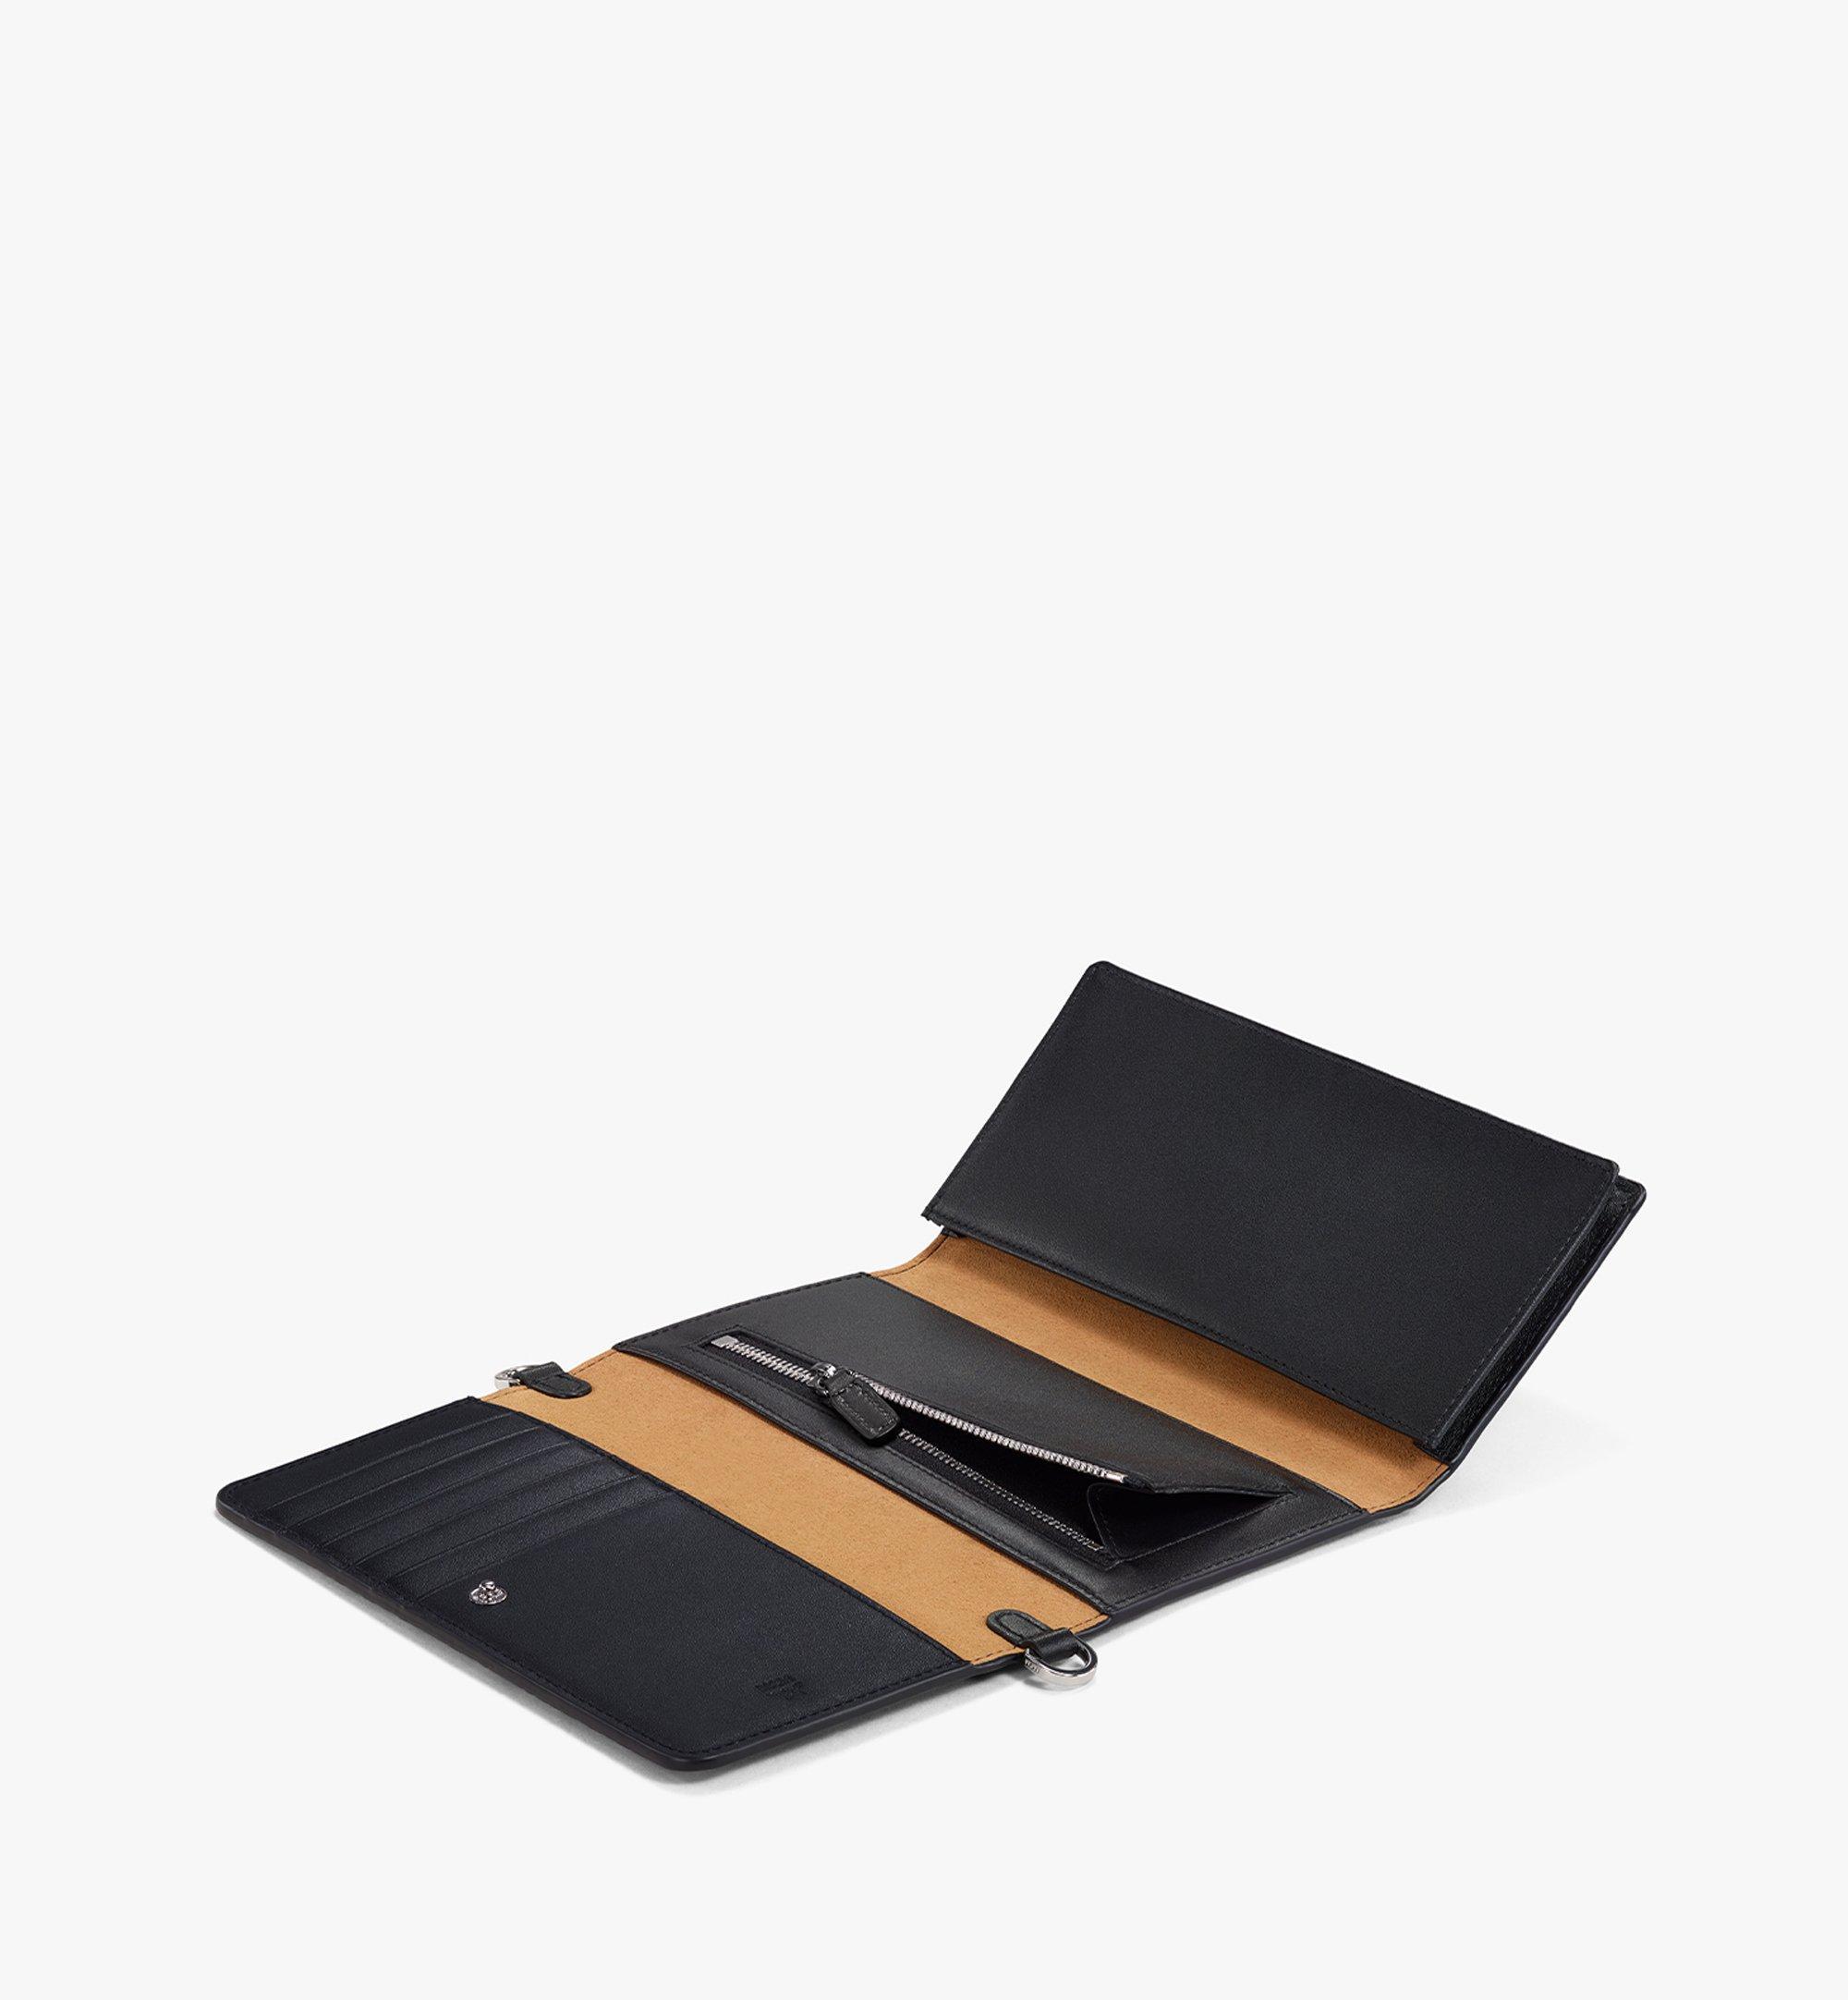 MCM กระเป๋าสตางค์ใส่โทรศัพท์มือถือครอสบอดี้ลาย Visetos Original Black MXEBSVI01BK001 มุมมองอื่น 1